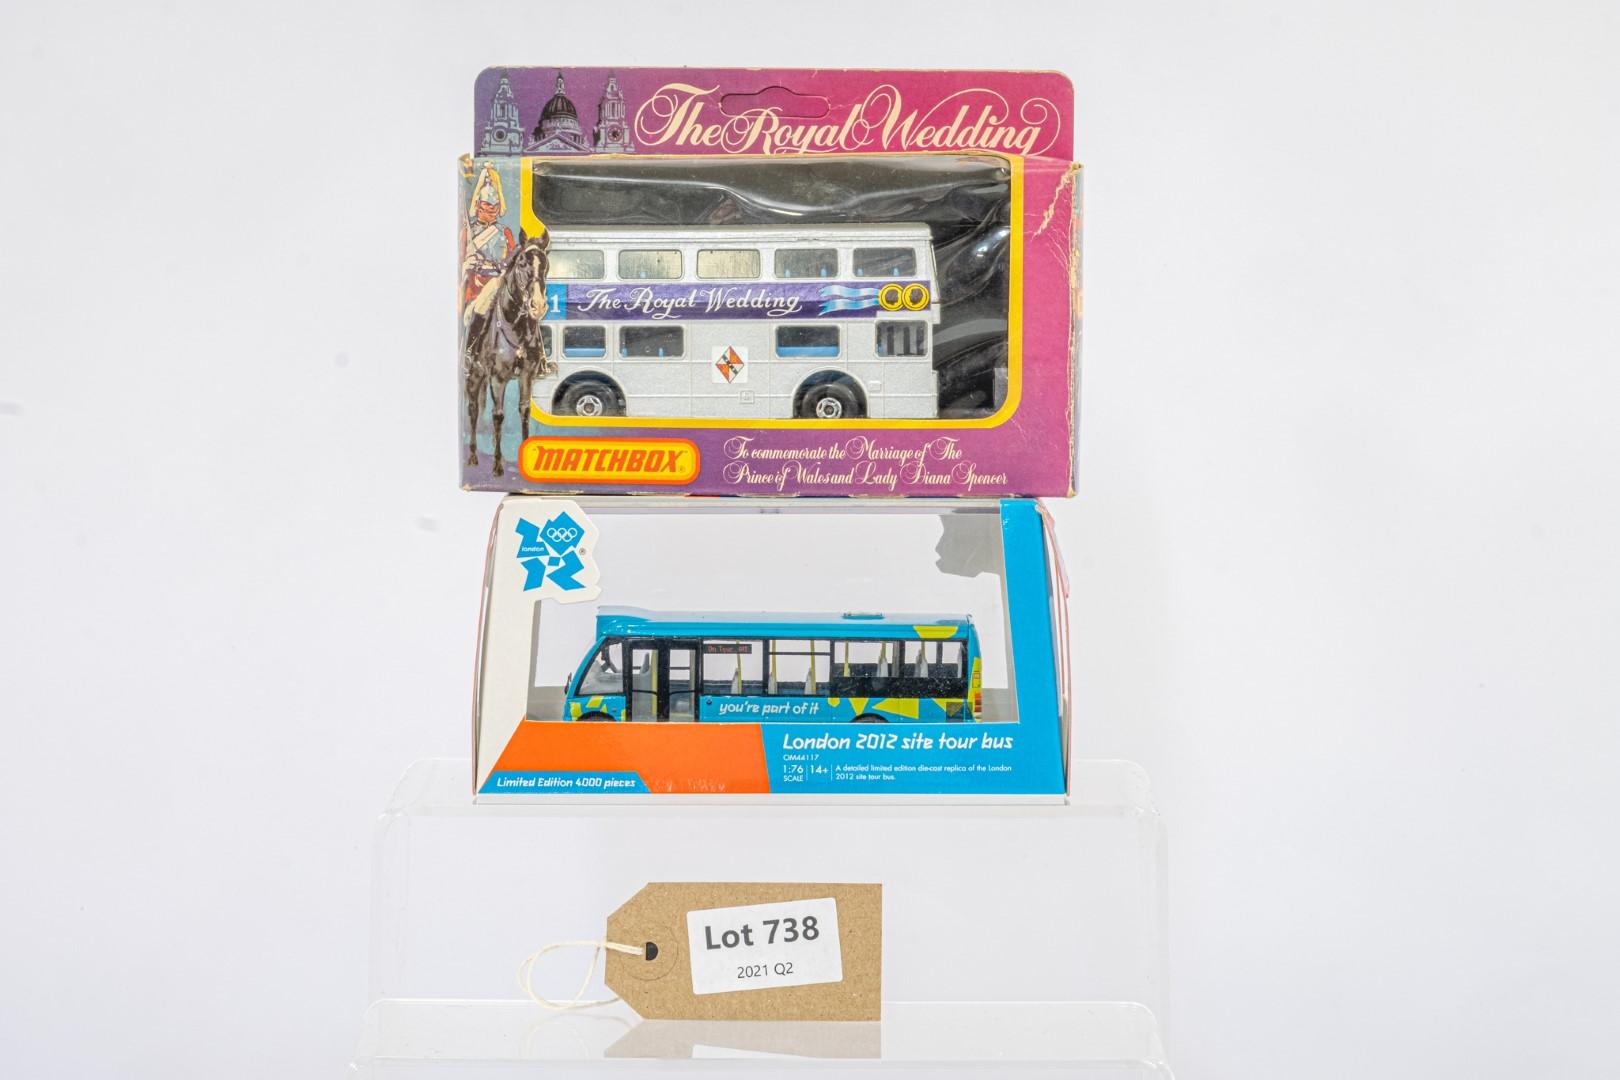 2 x bus models - Corgi OM44117 London 2012 & Matchbox KRW-15 The Royal Wedding